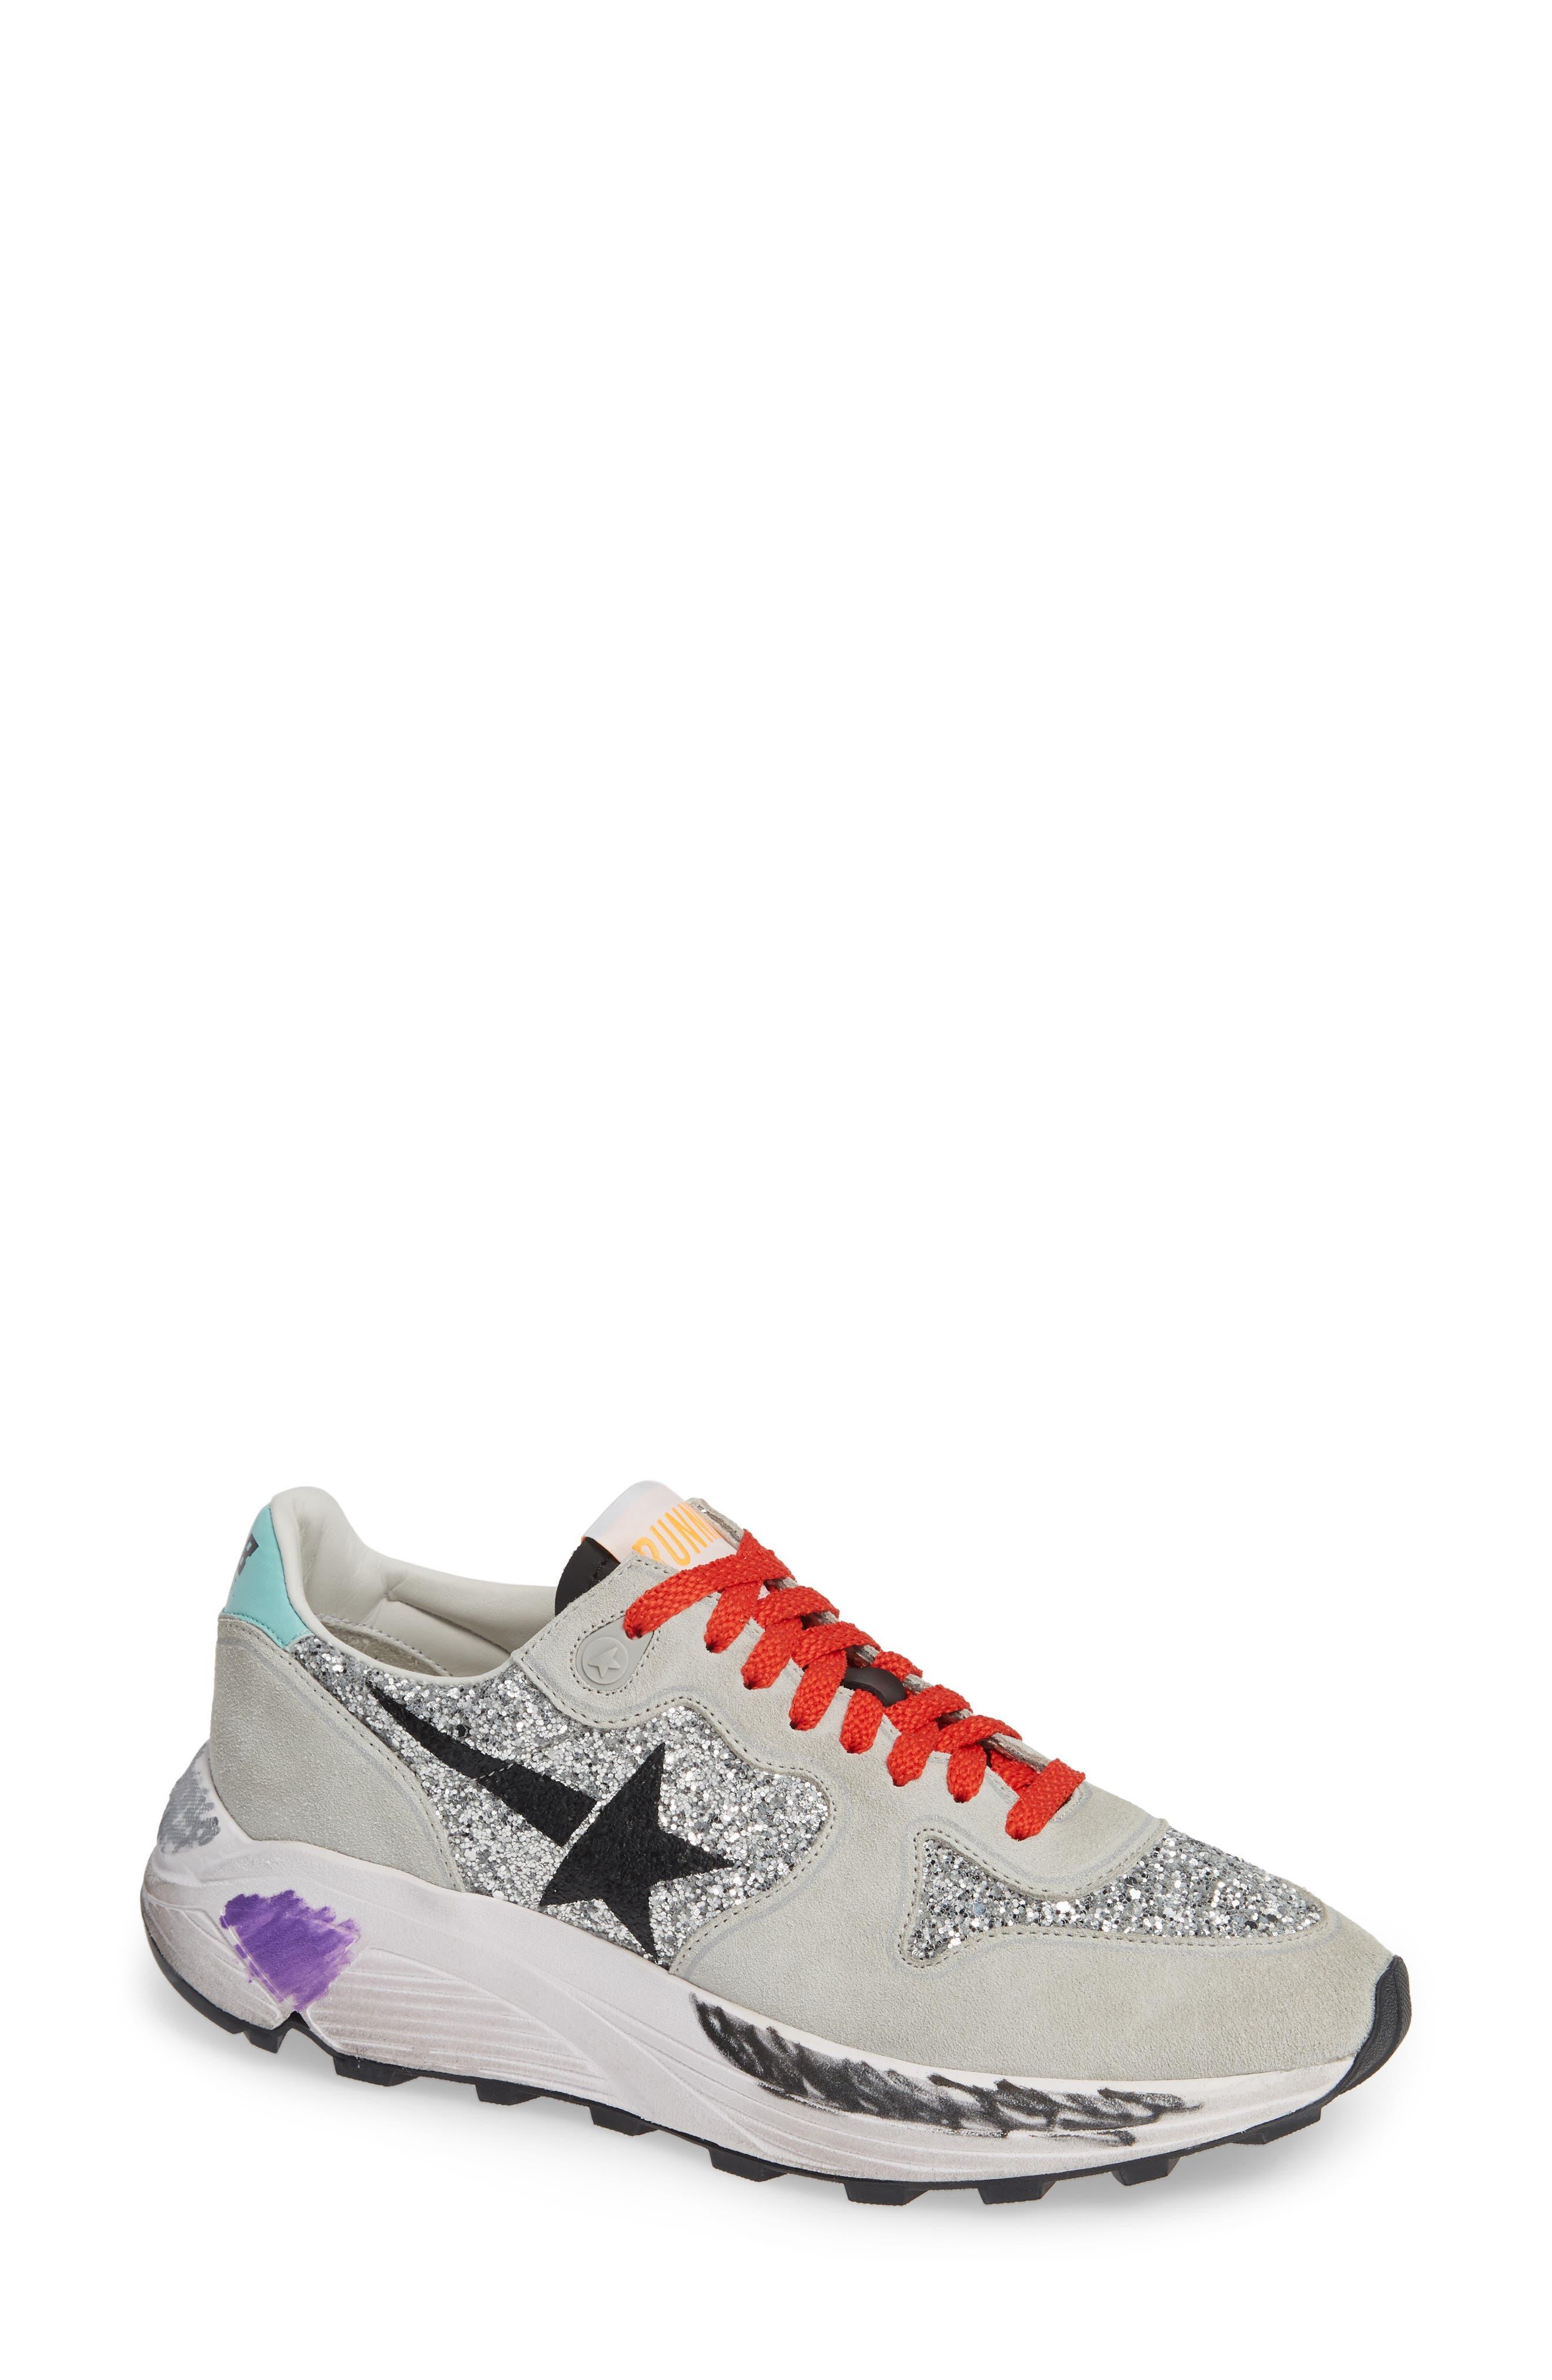 Glitter & Suede Running Sneakers in Silver Glitter/ Black